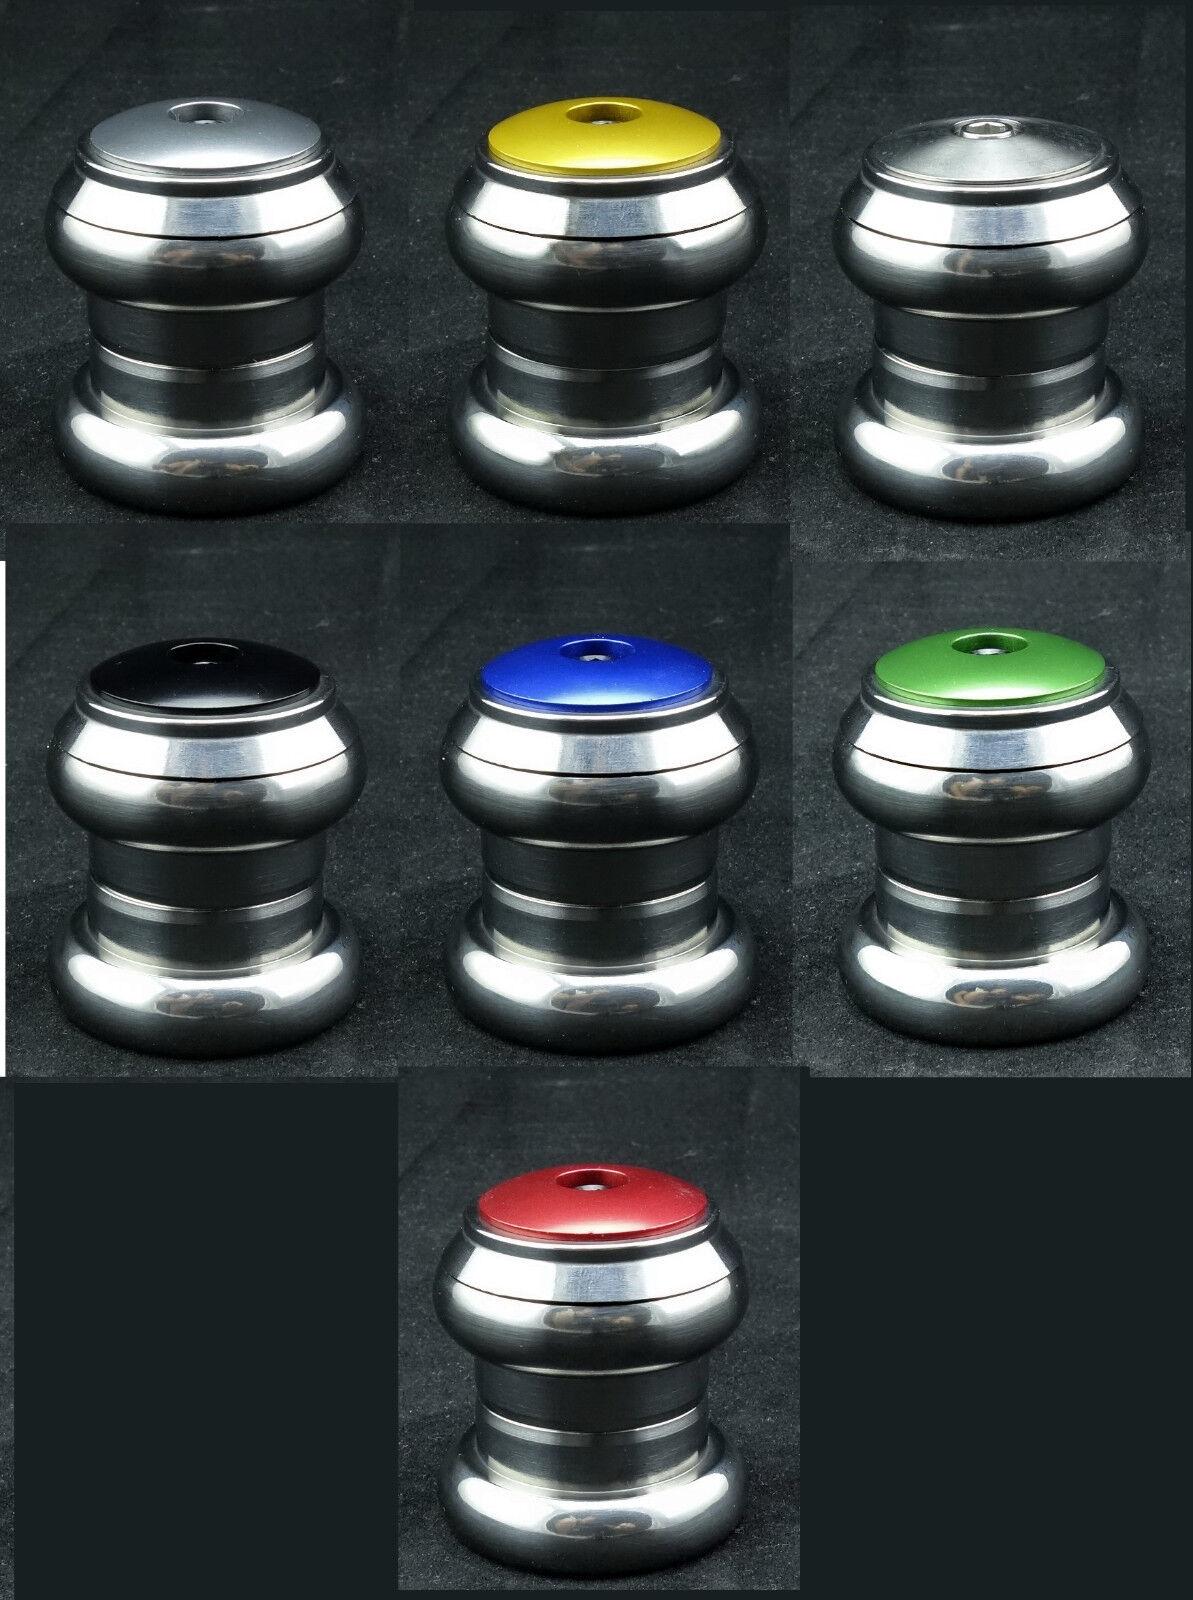 J&L Titanium Ti Ceramics Bearing External Headset 1'1 8 -34MM-105g